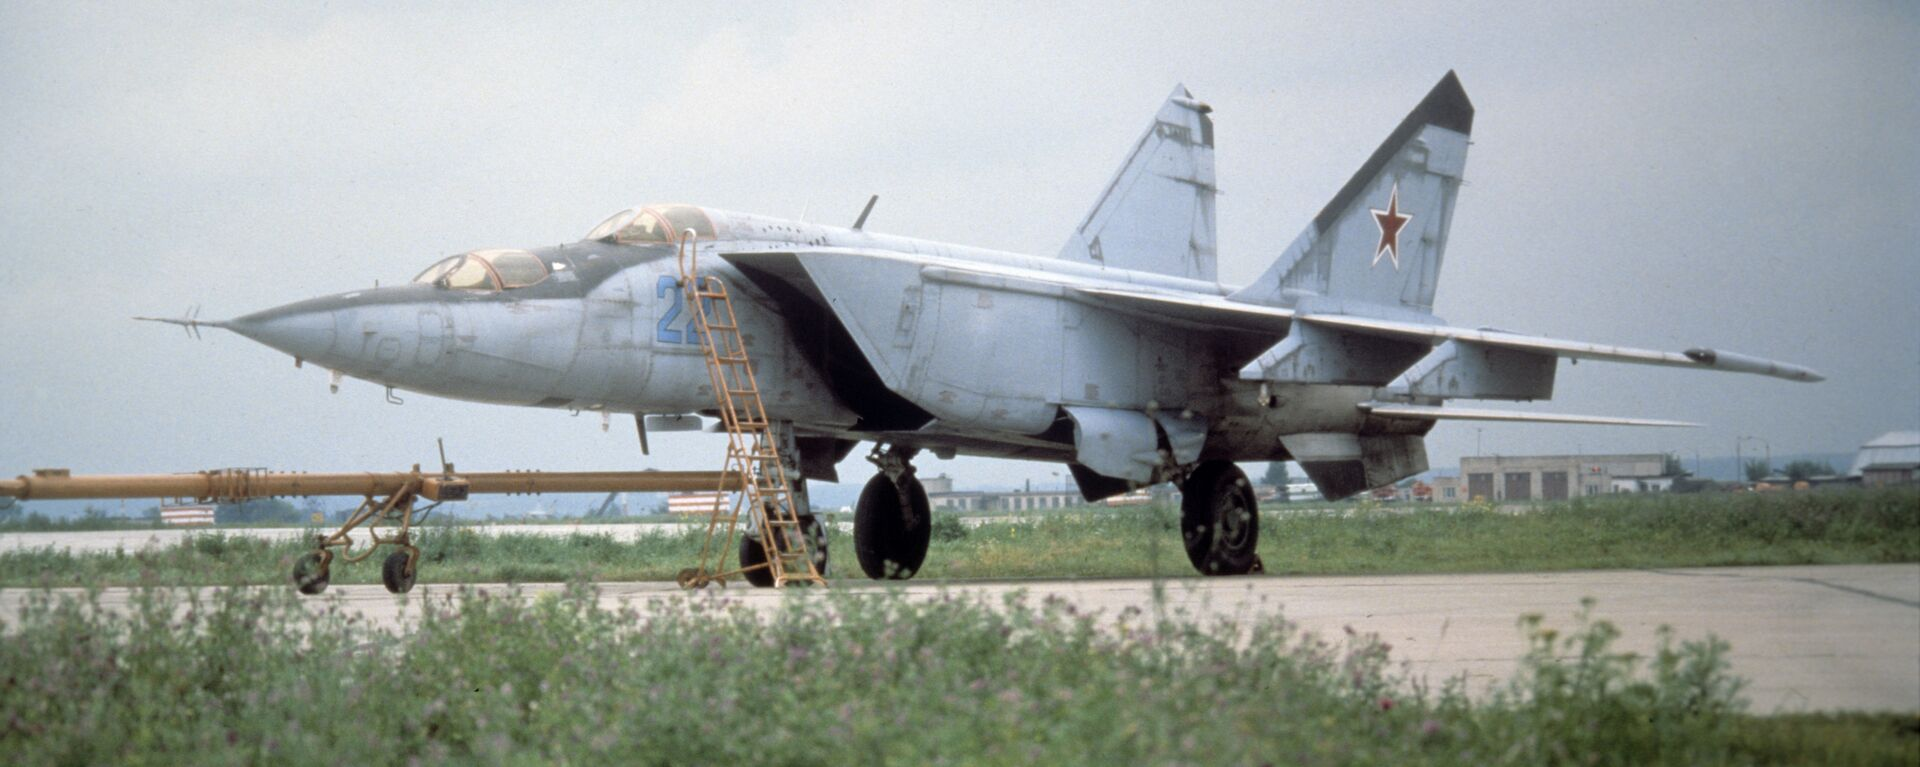 MiG-25, caza soviético (archivo) - Sputnik Mundo, 1920, 28.06.2018